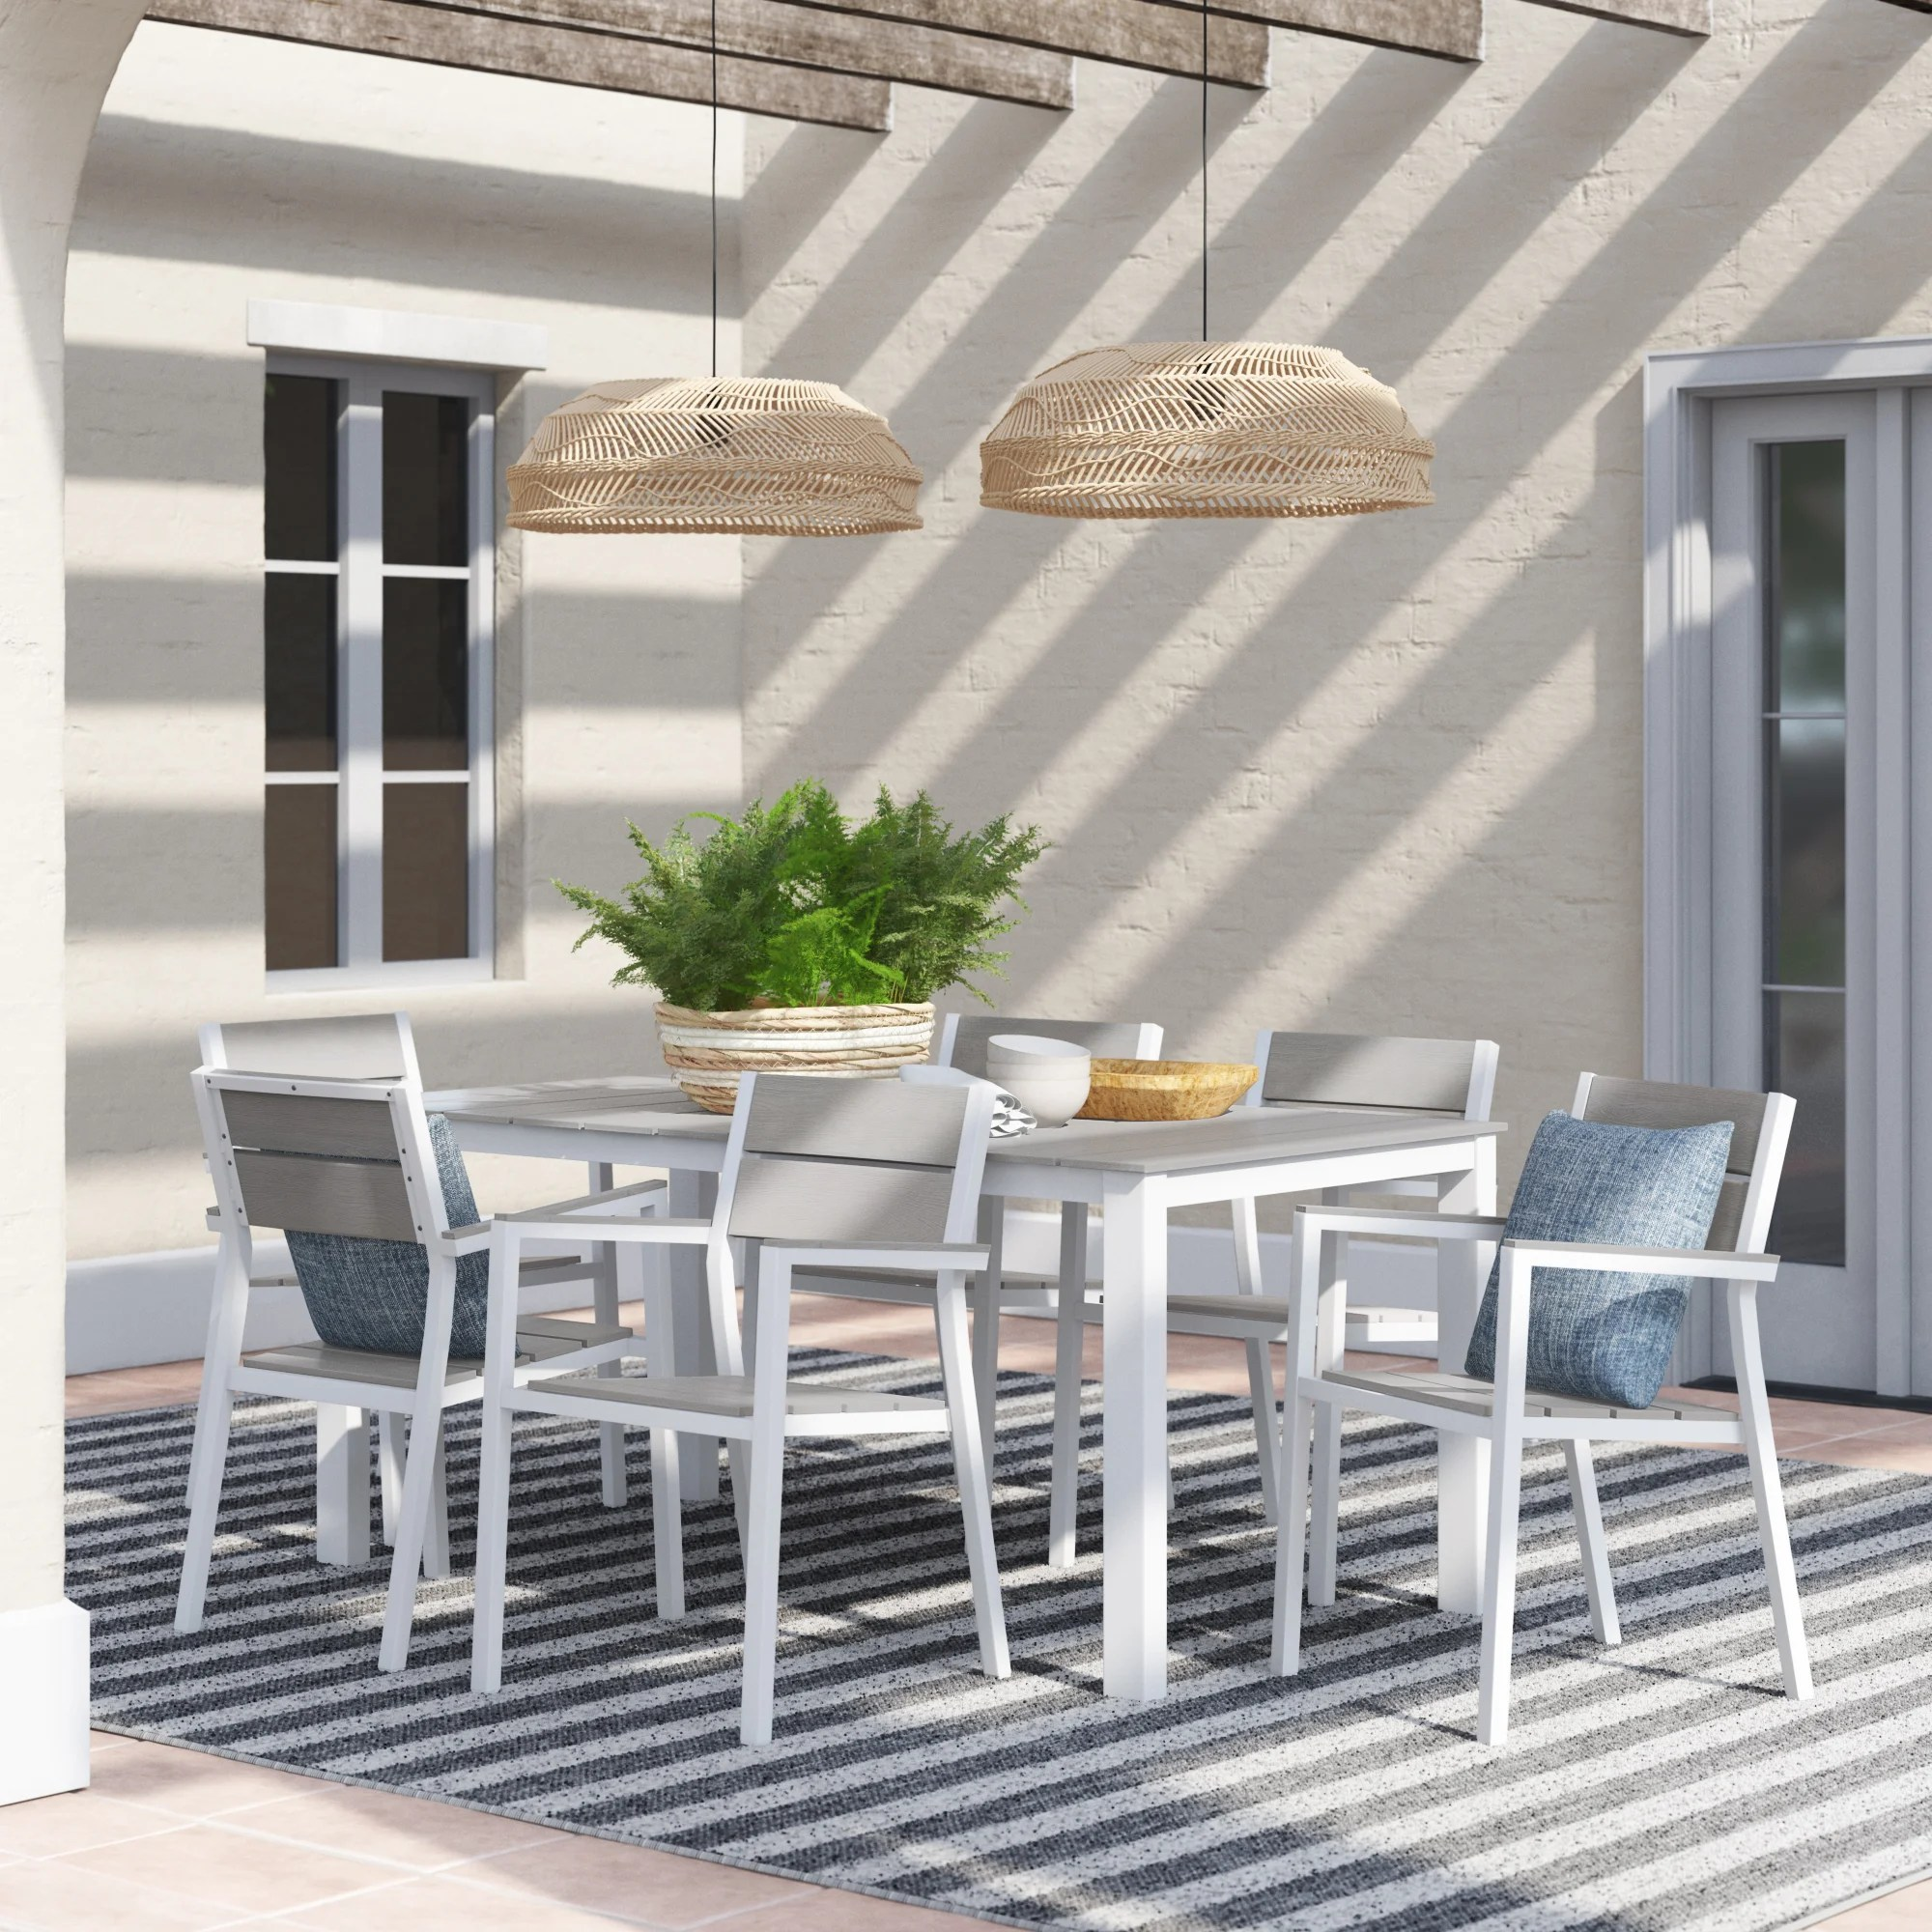 churchton outdoor patio 7 piece dining set